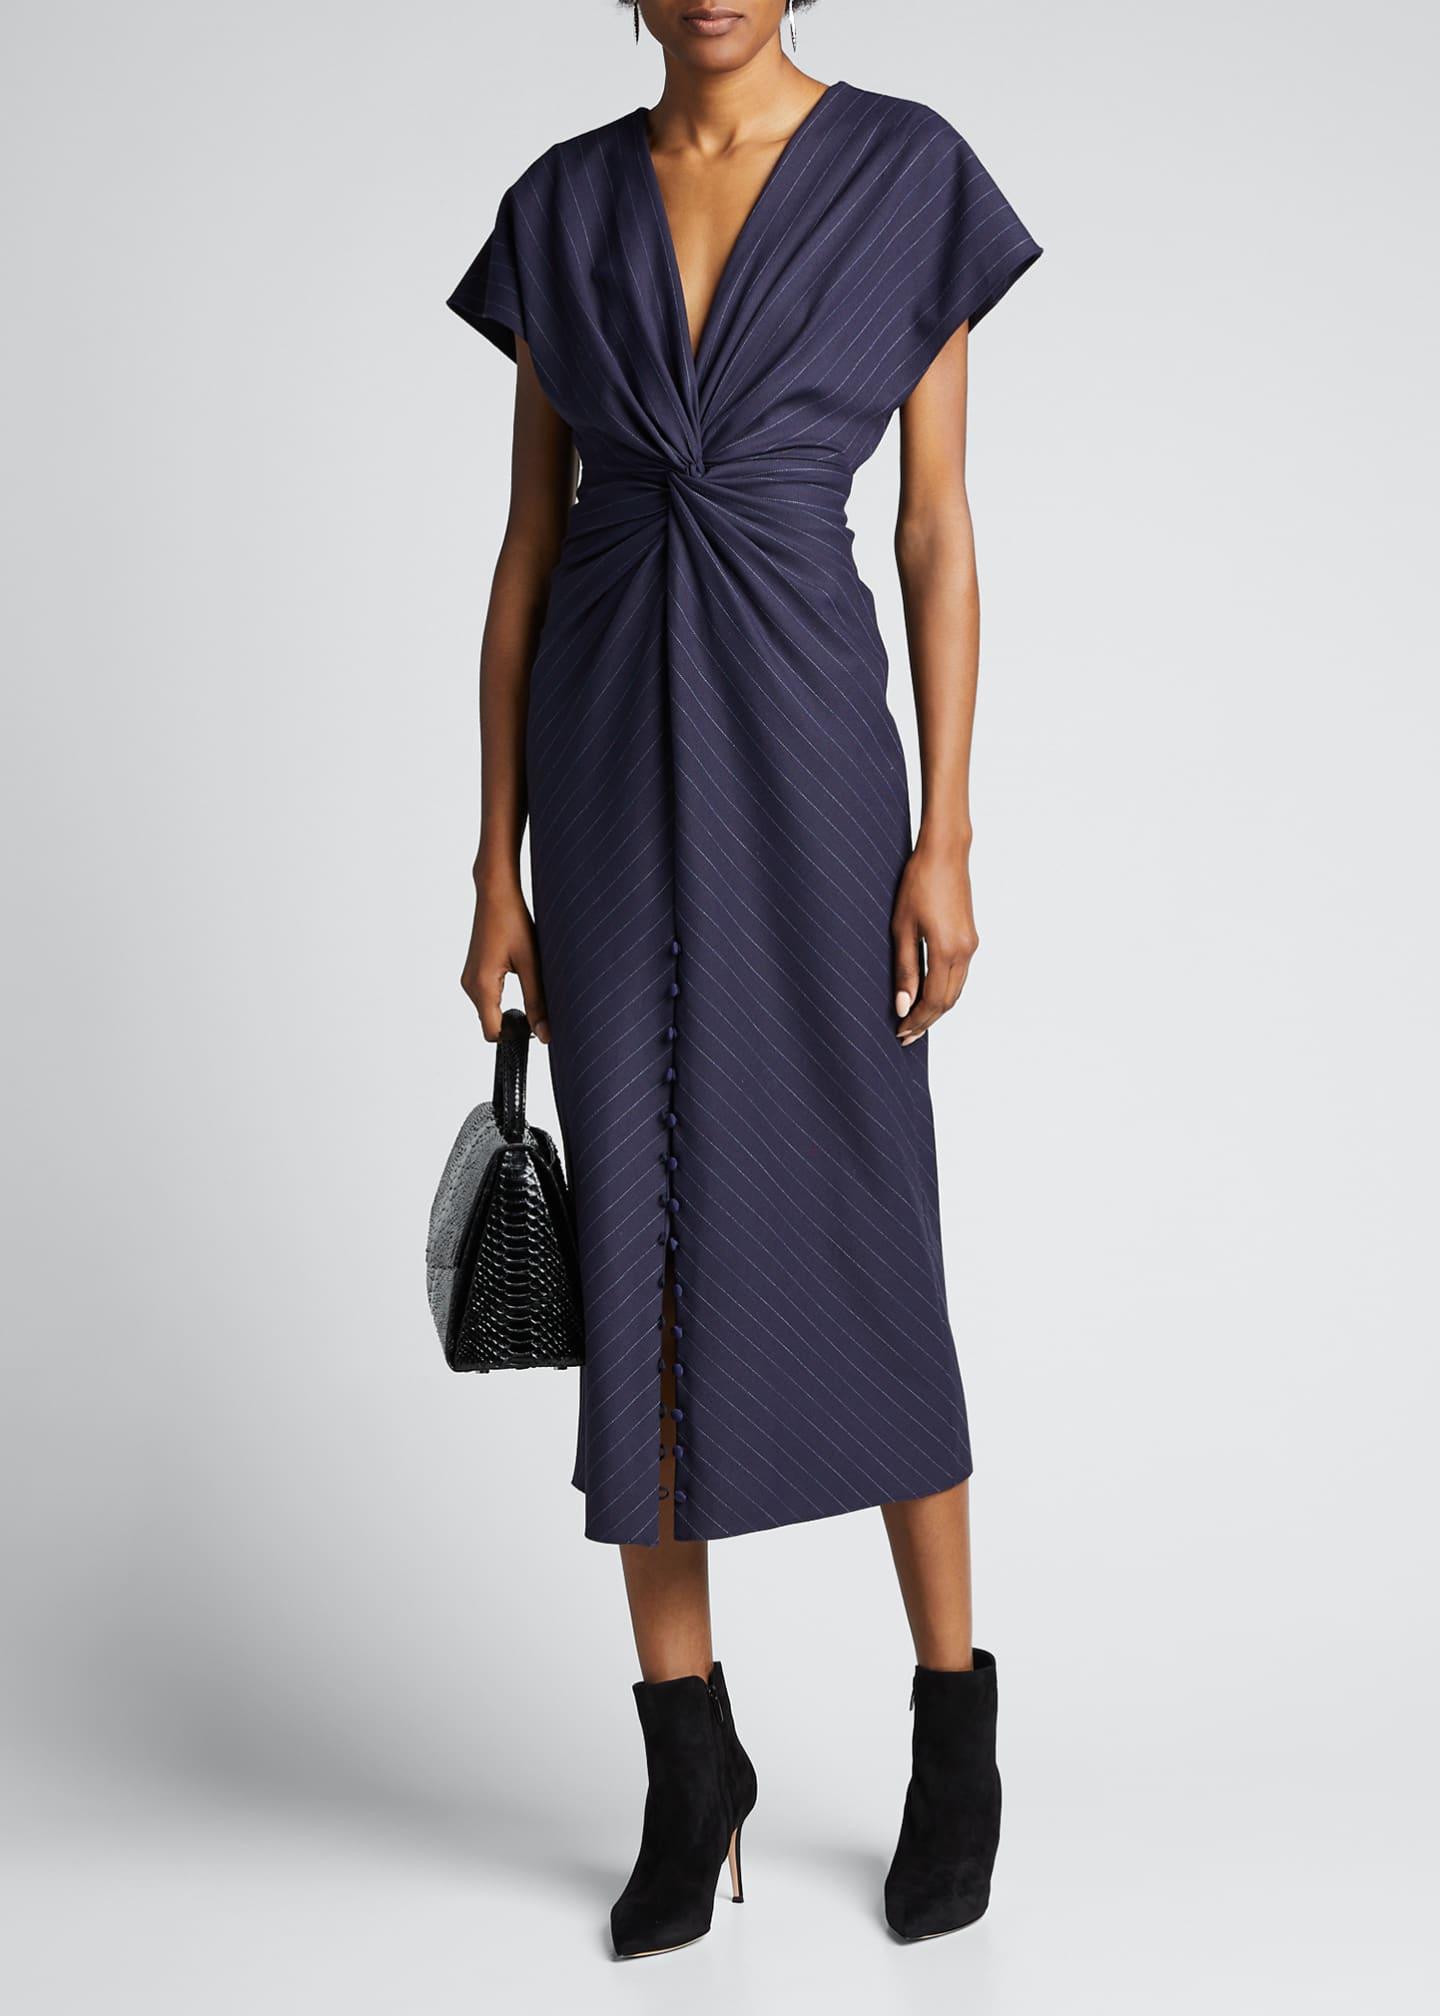 Prabal Gurung Pinstriped V-Neck Cocktail Dress